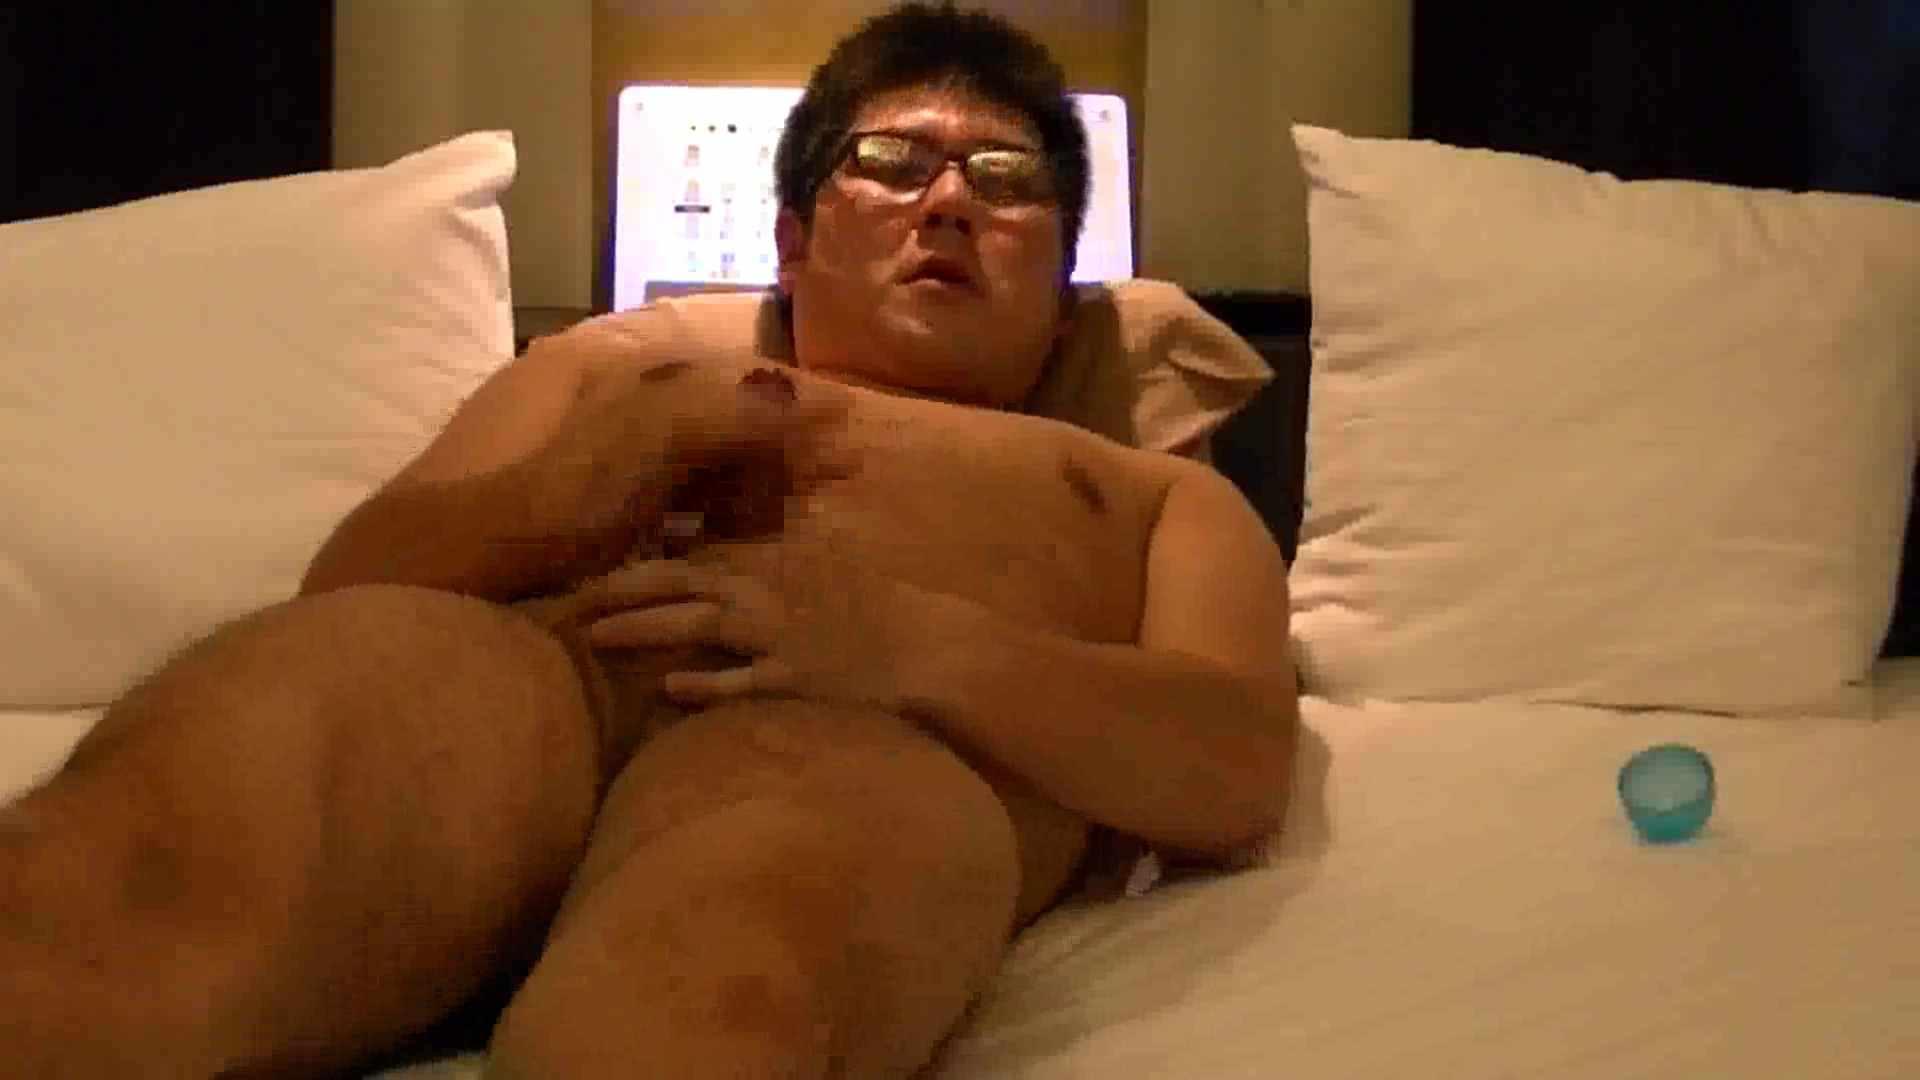 ONA見せカーニバル!! Vol5 エッチ ゲイ無修正ビデオ画像 108枚 85